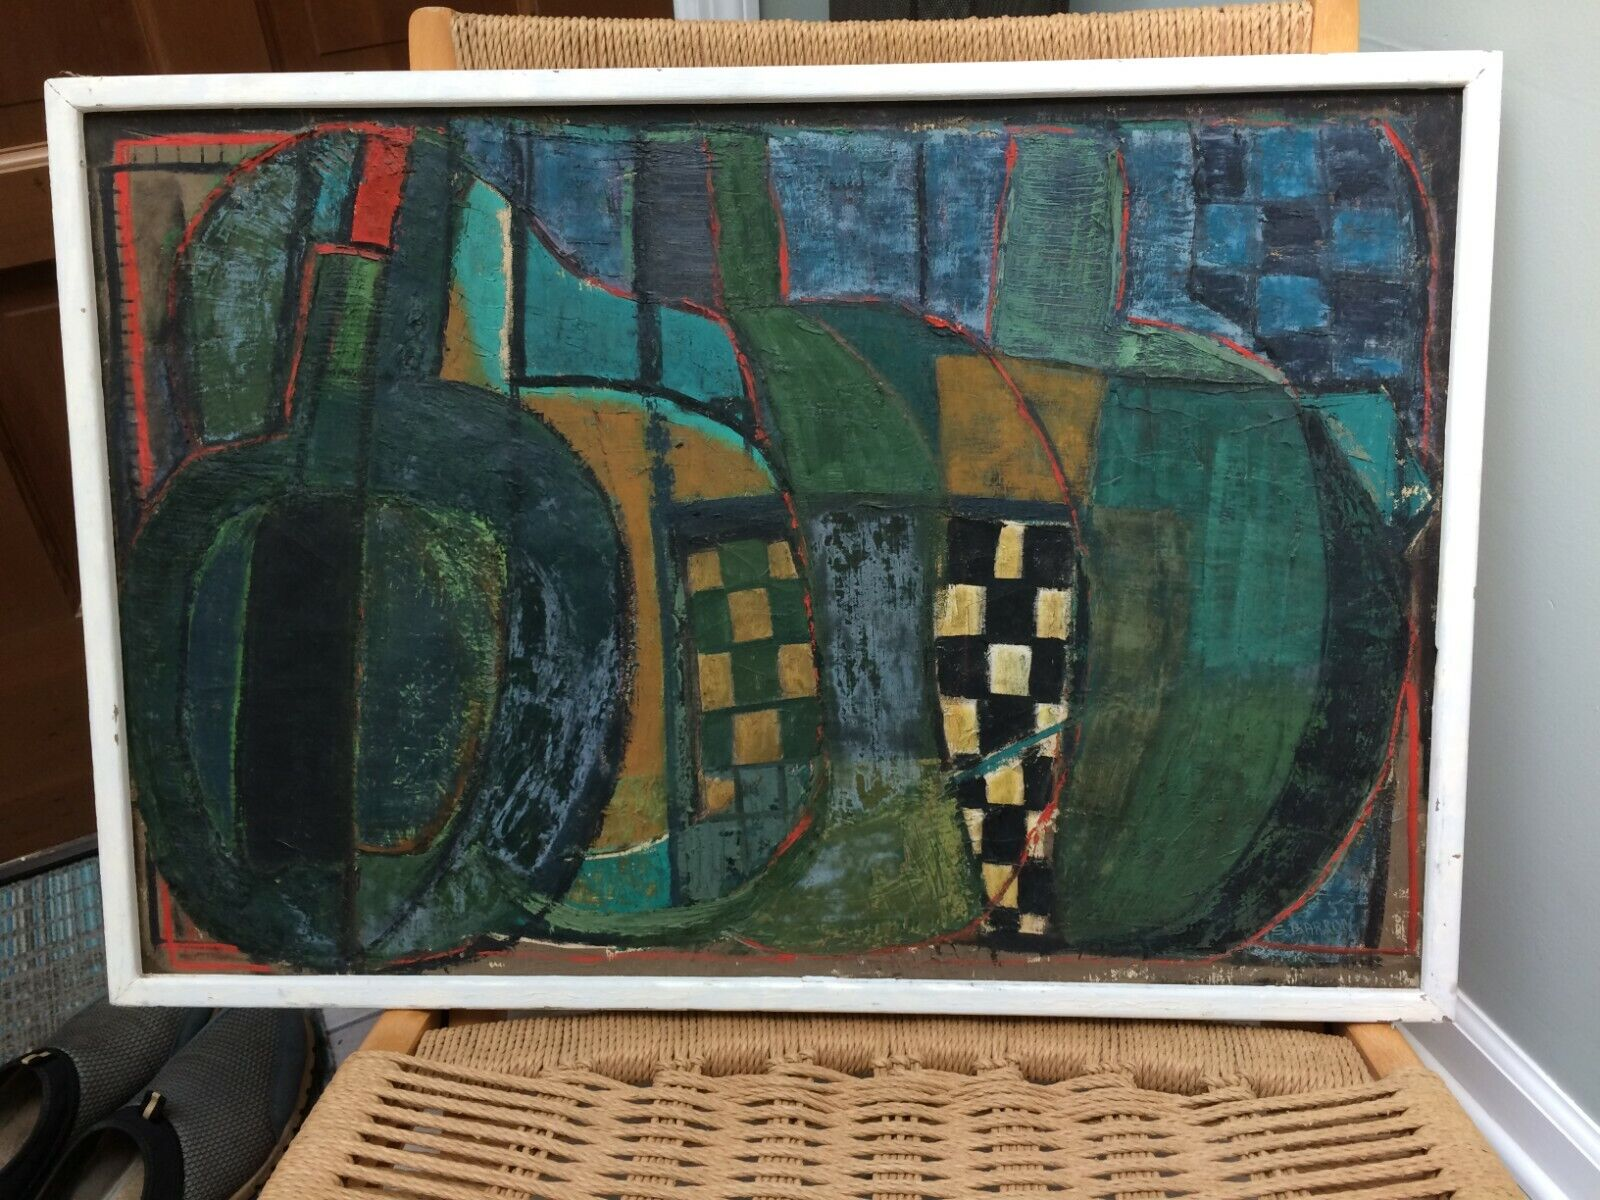 1950 S. Barron Abstract Painting Canadian Artist/Cartoonist/Illustrator 21 x31  - $250.00